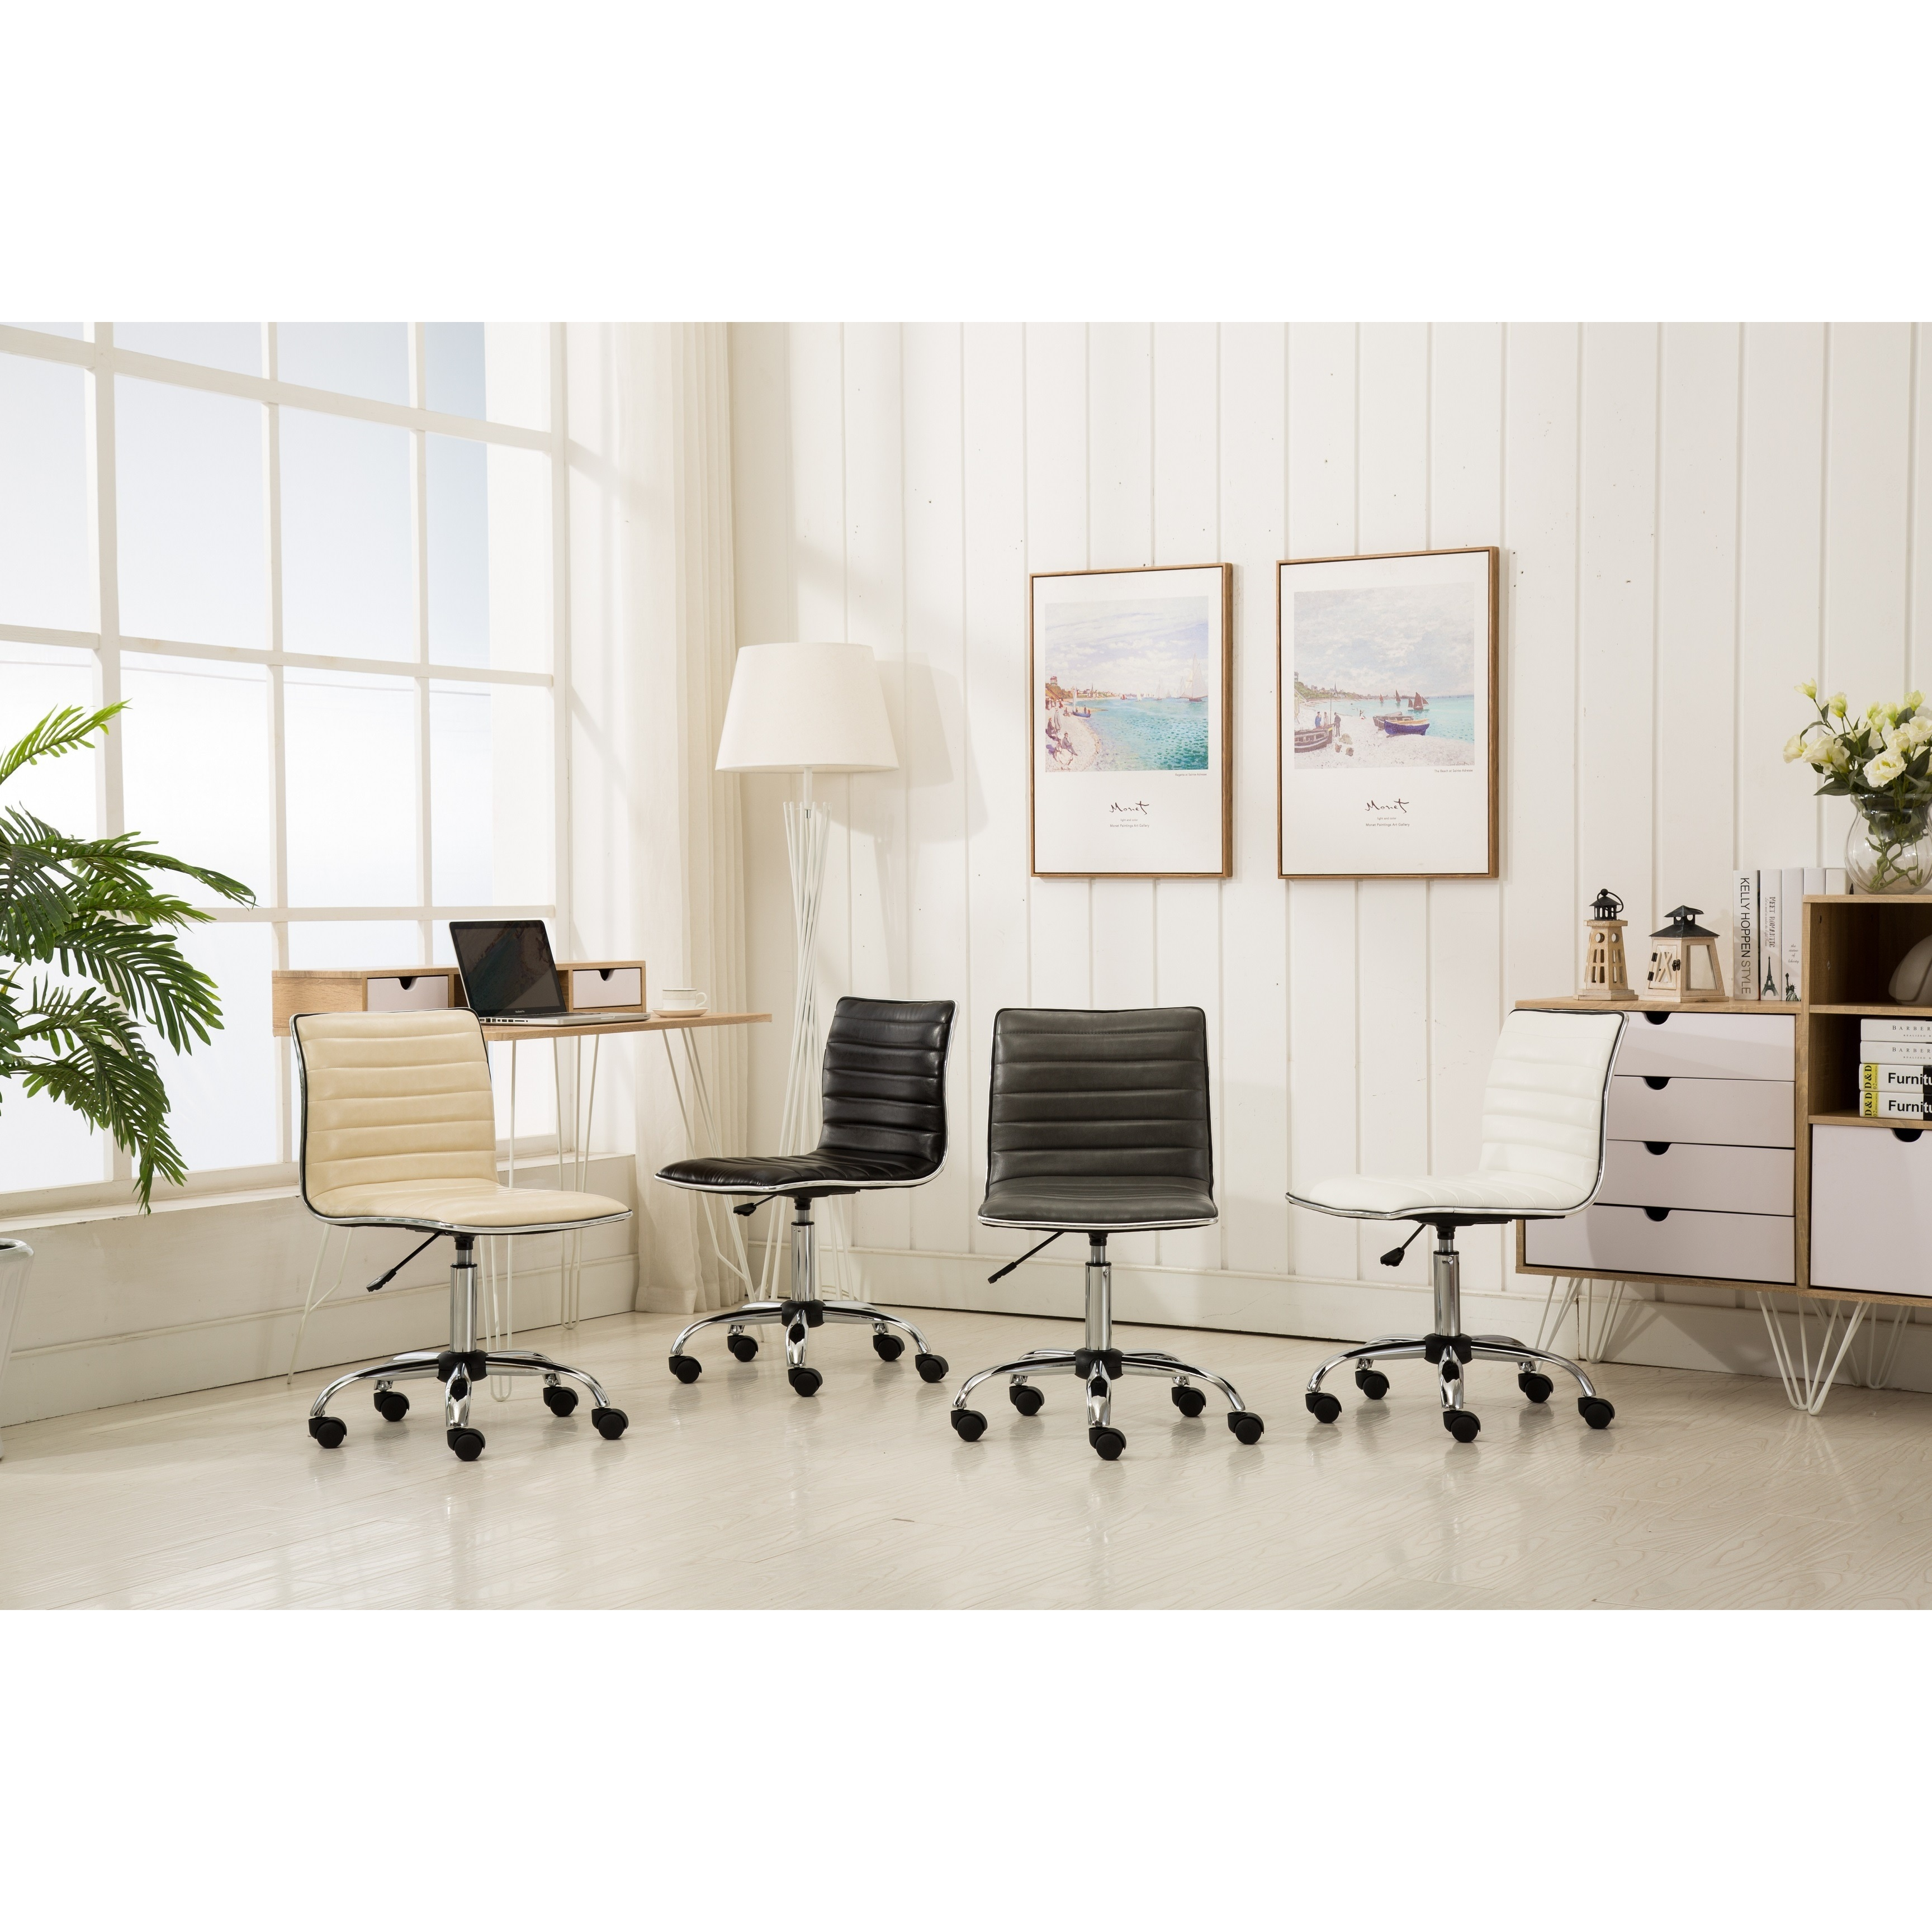 Black Fremo Chromel Contemporary Office Chair